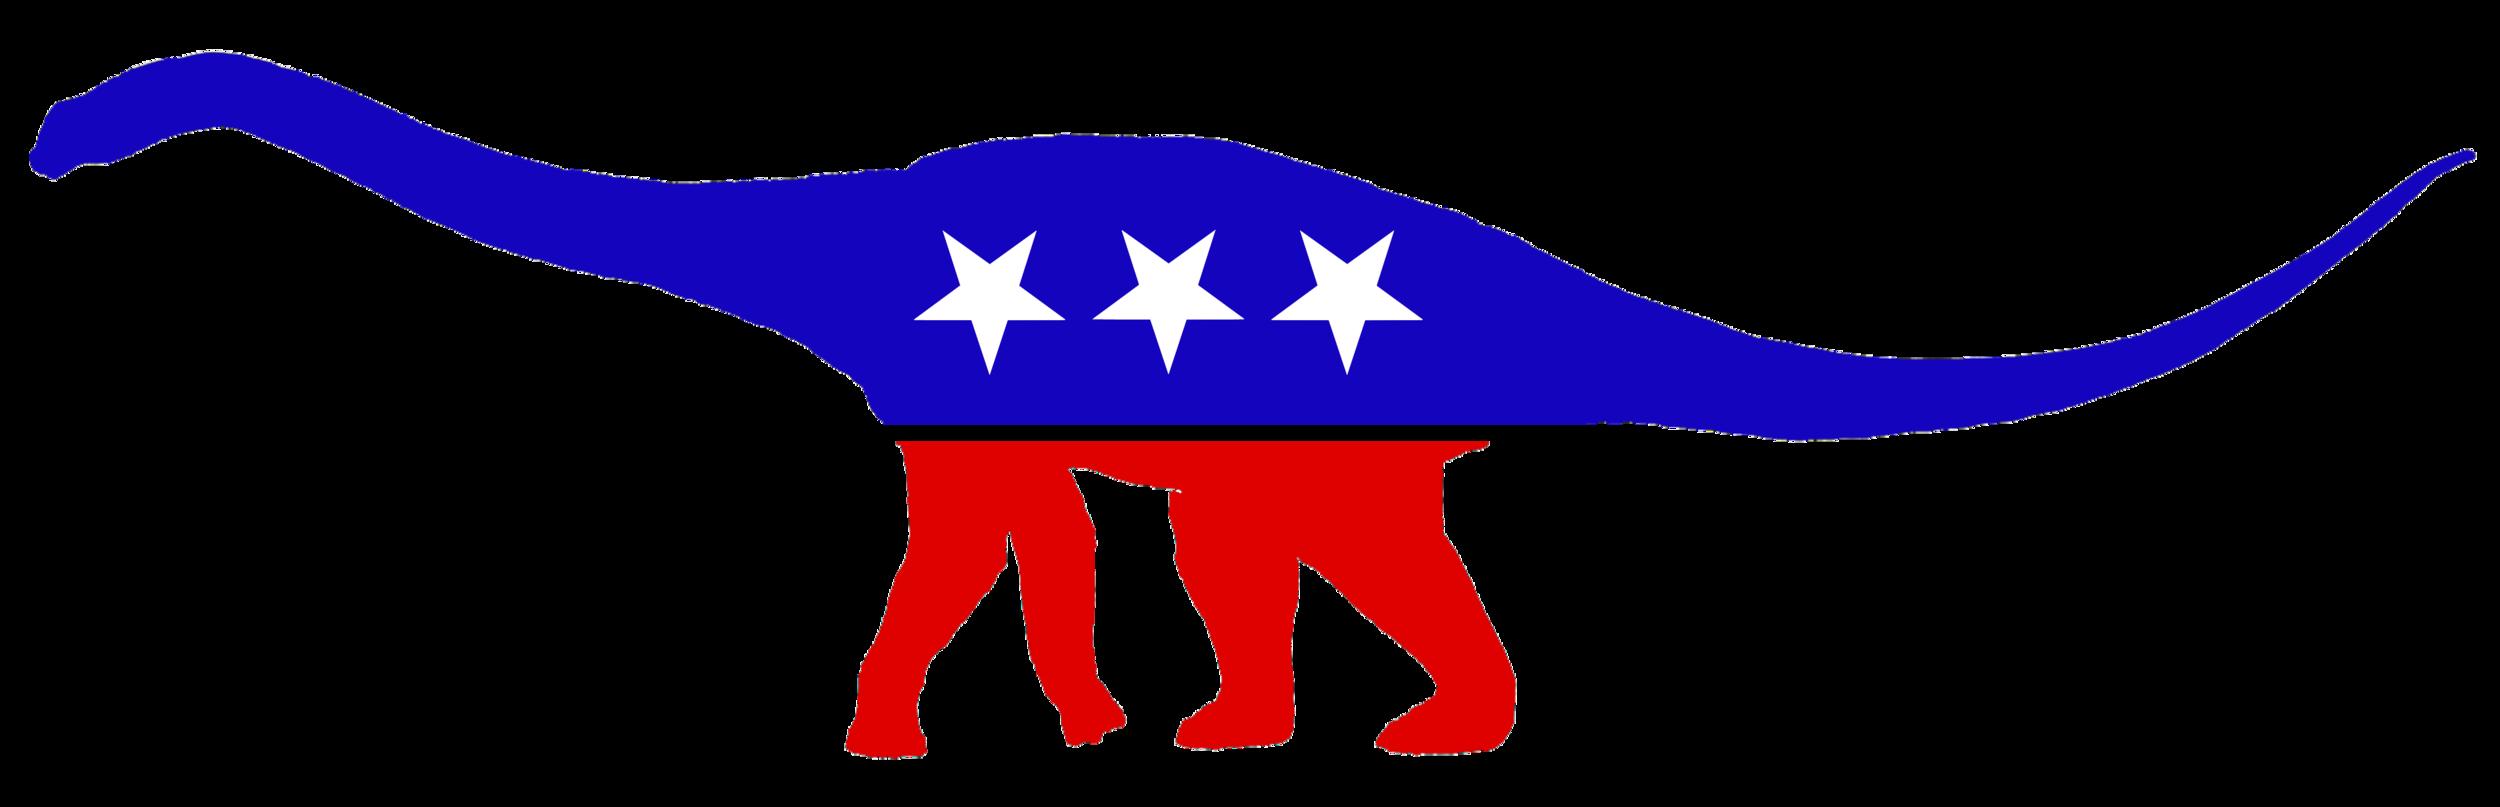 political-dinosaur.png